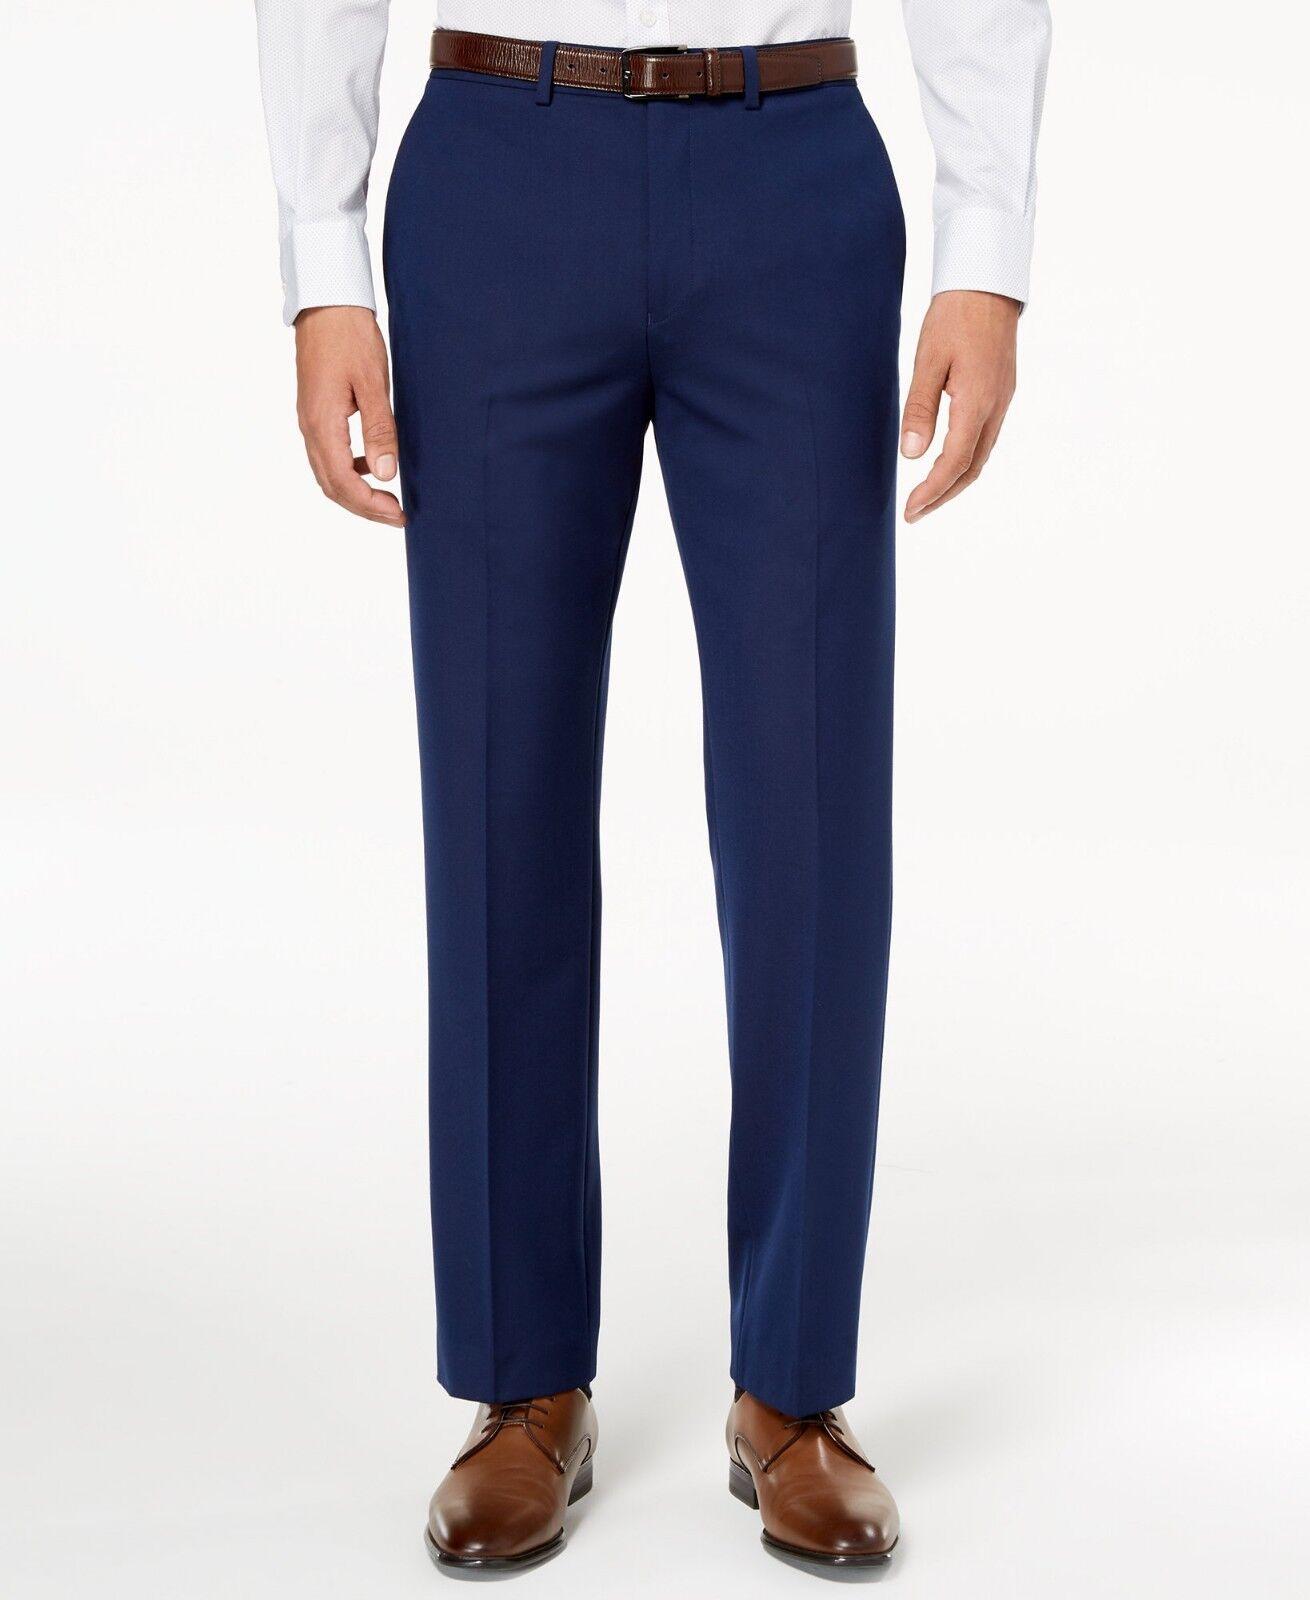 RYAN SEACREST Mens blueE FIT FLAT FRONT DRESS PANTS TROUSERS 38 W 30 L